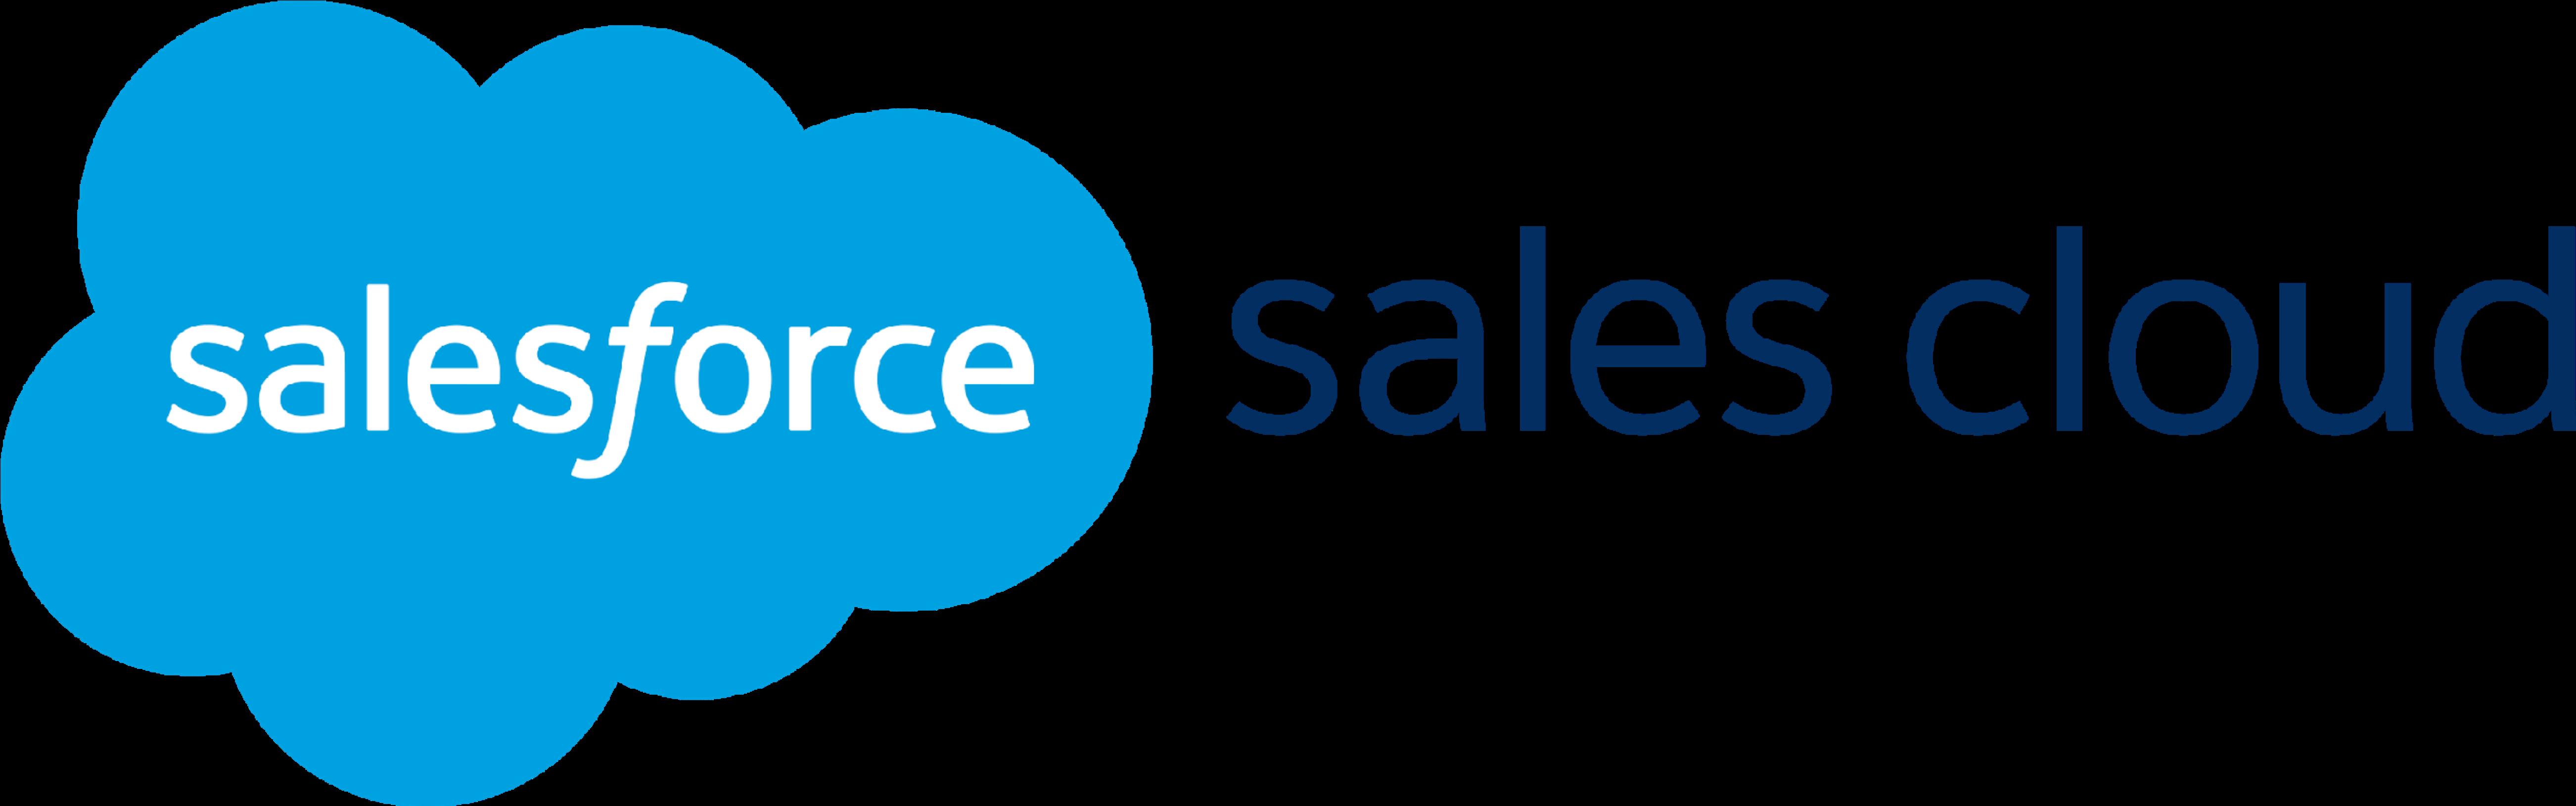 Salesforce Sales Cloud logo